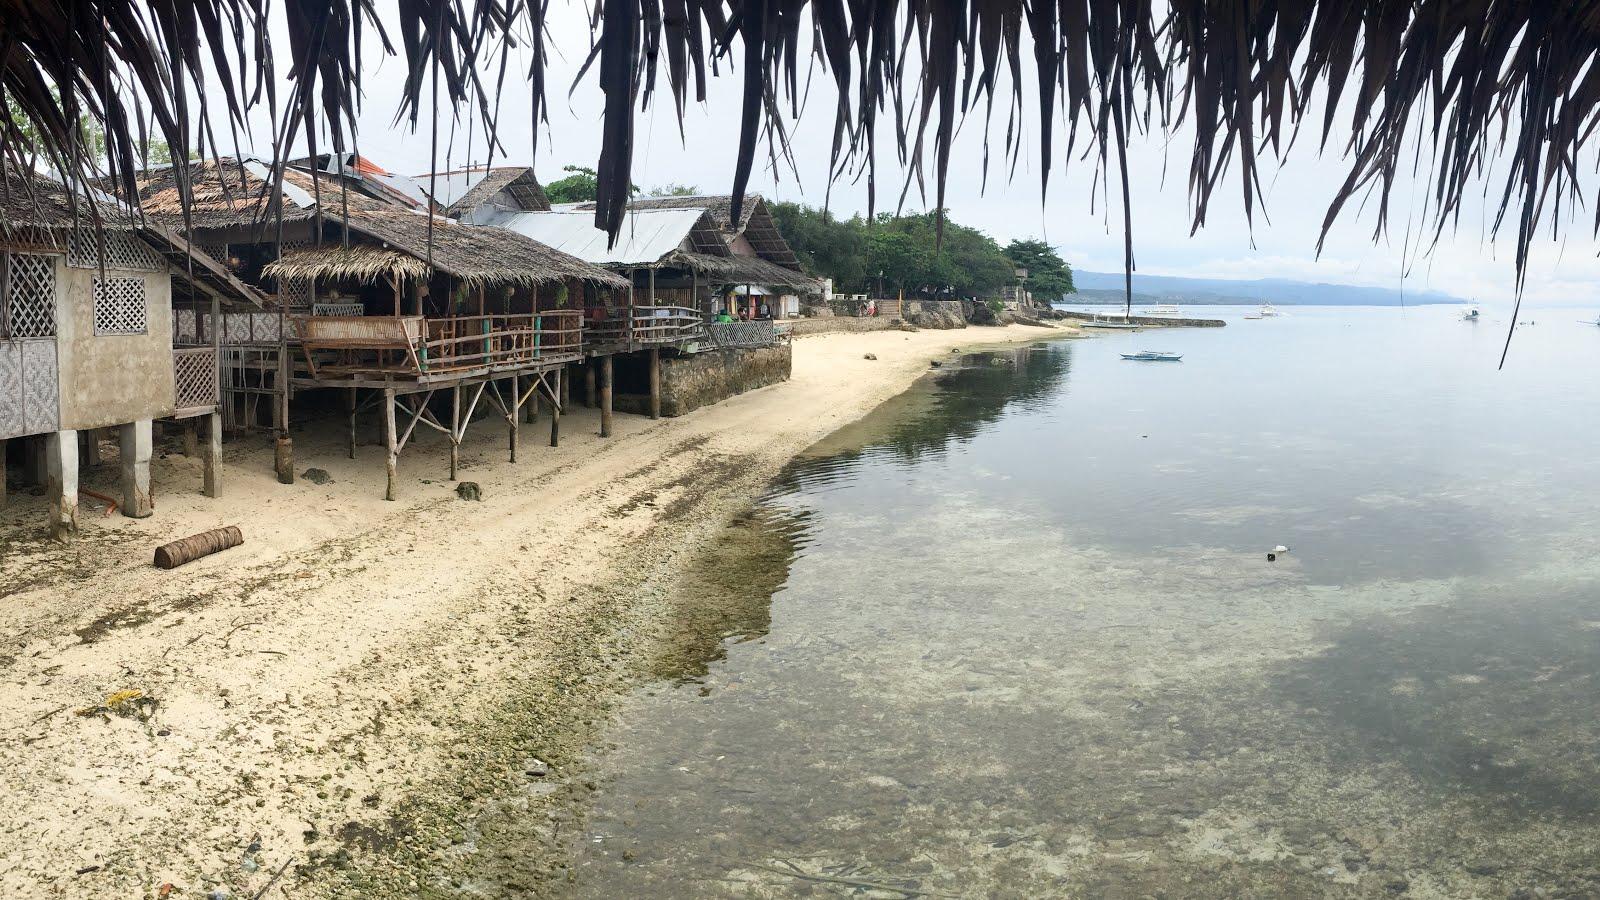 Panagsama Beach Moalboal